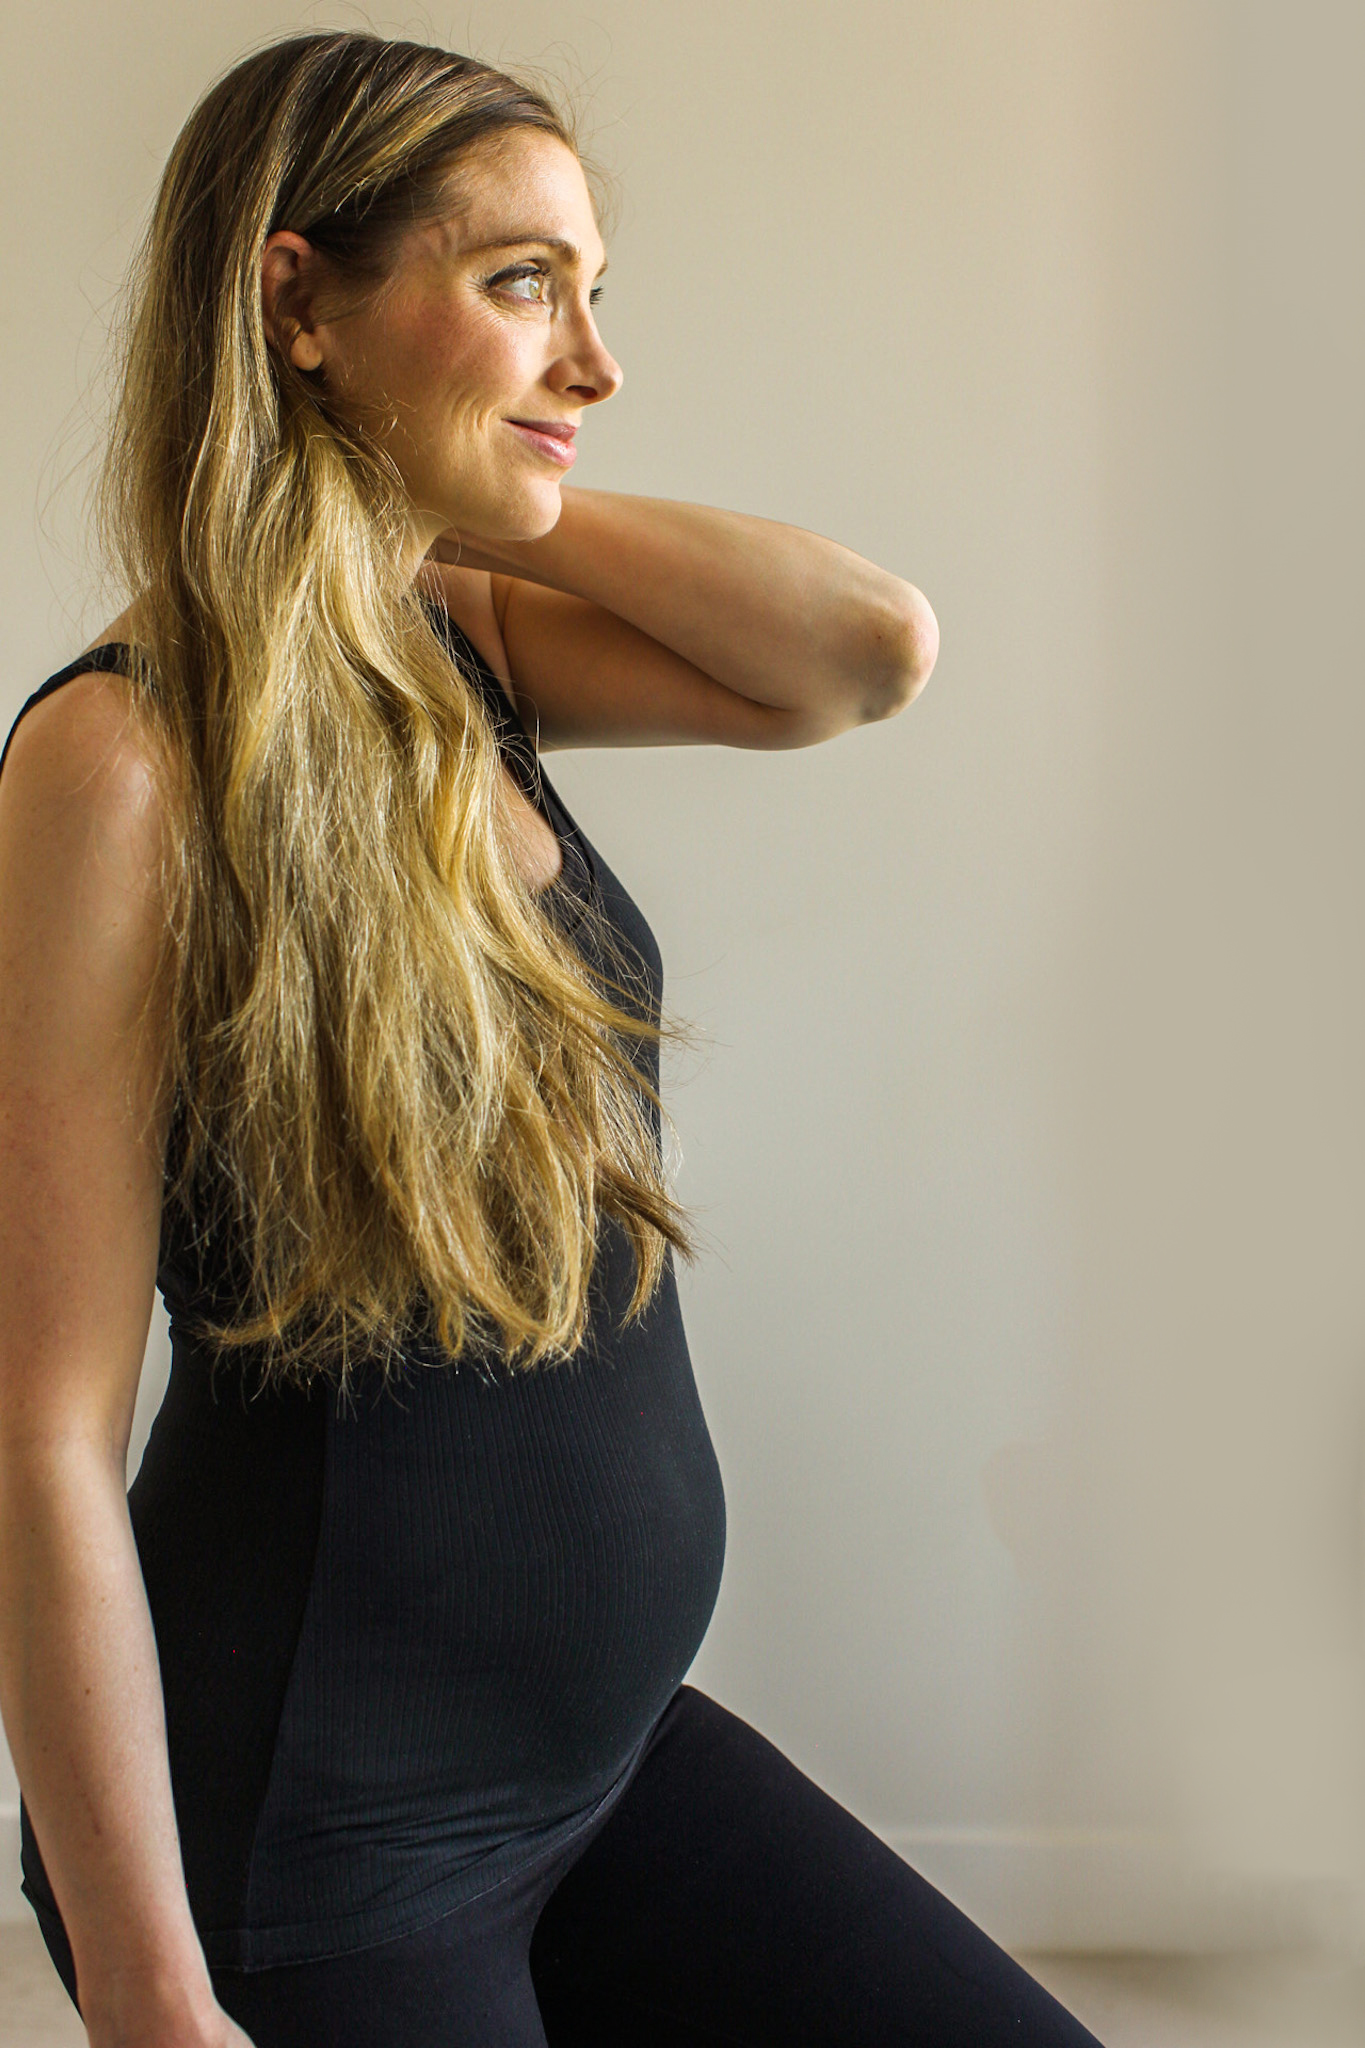 kathy patalsky pregnant 29 weeks